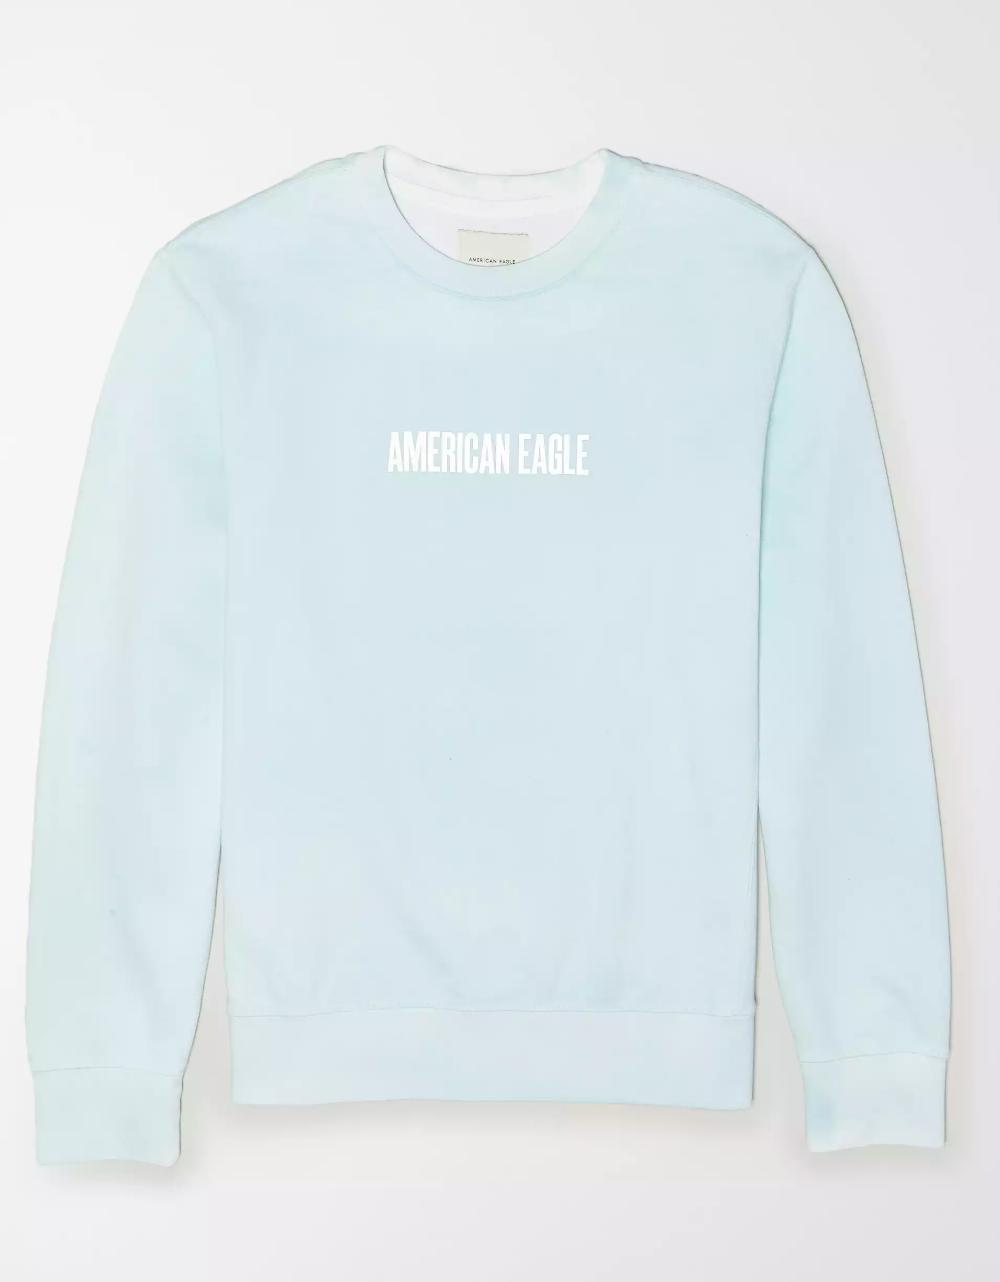 Ae Garment Dyed Graphic Crew Neck Sweatshirt Graphic Crew Neck Sweatshirts Crew Neck Sweatshirt Latest Sweatshirts [ 1282 x 1000 Pixel ]